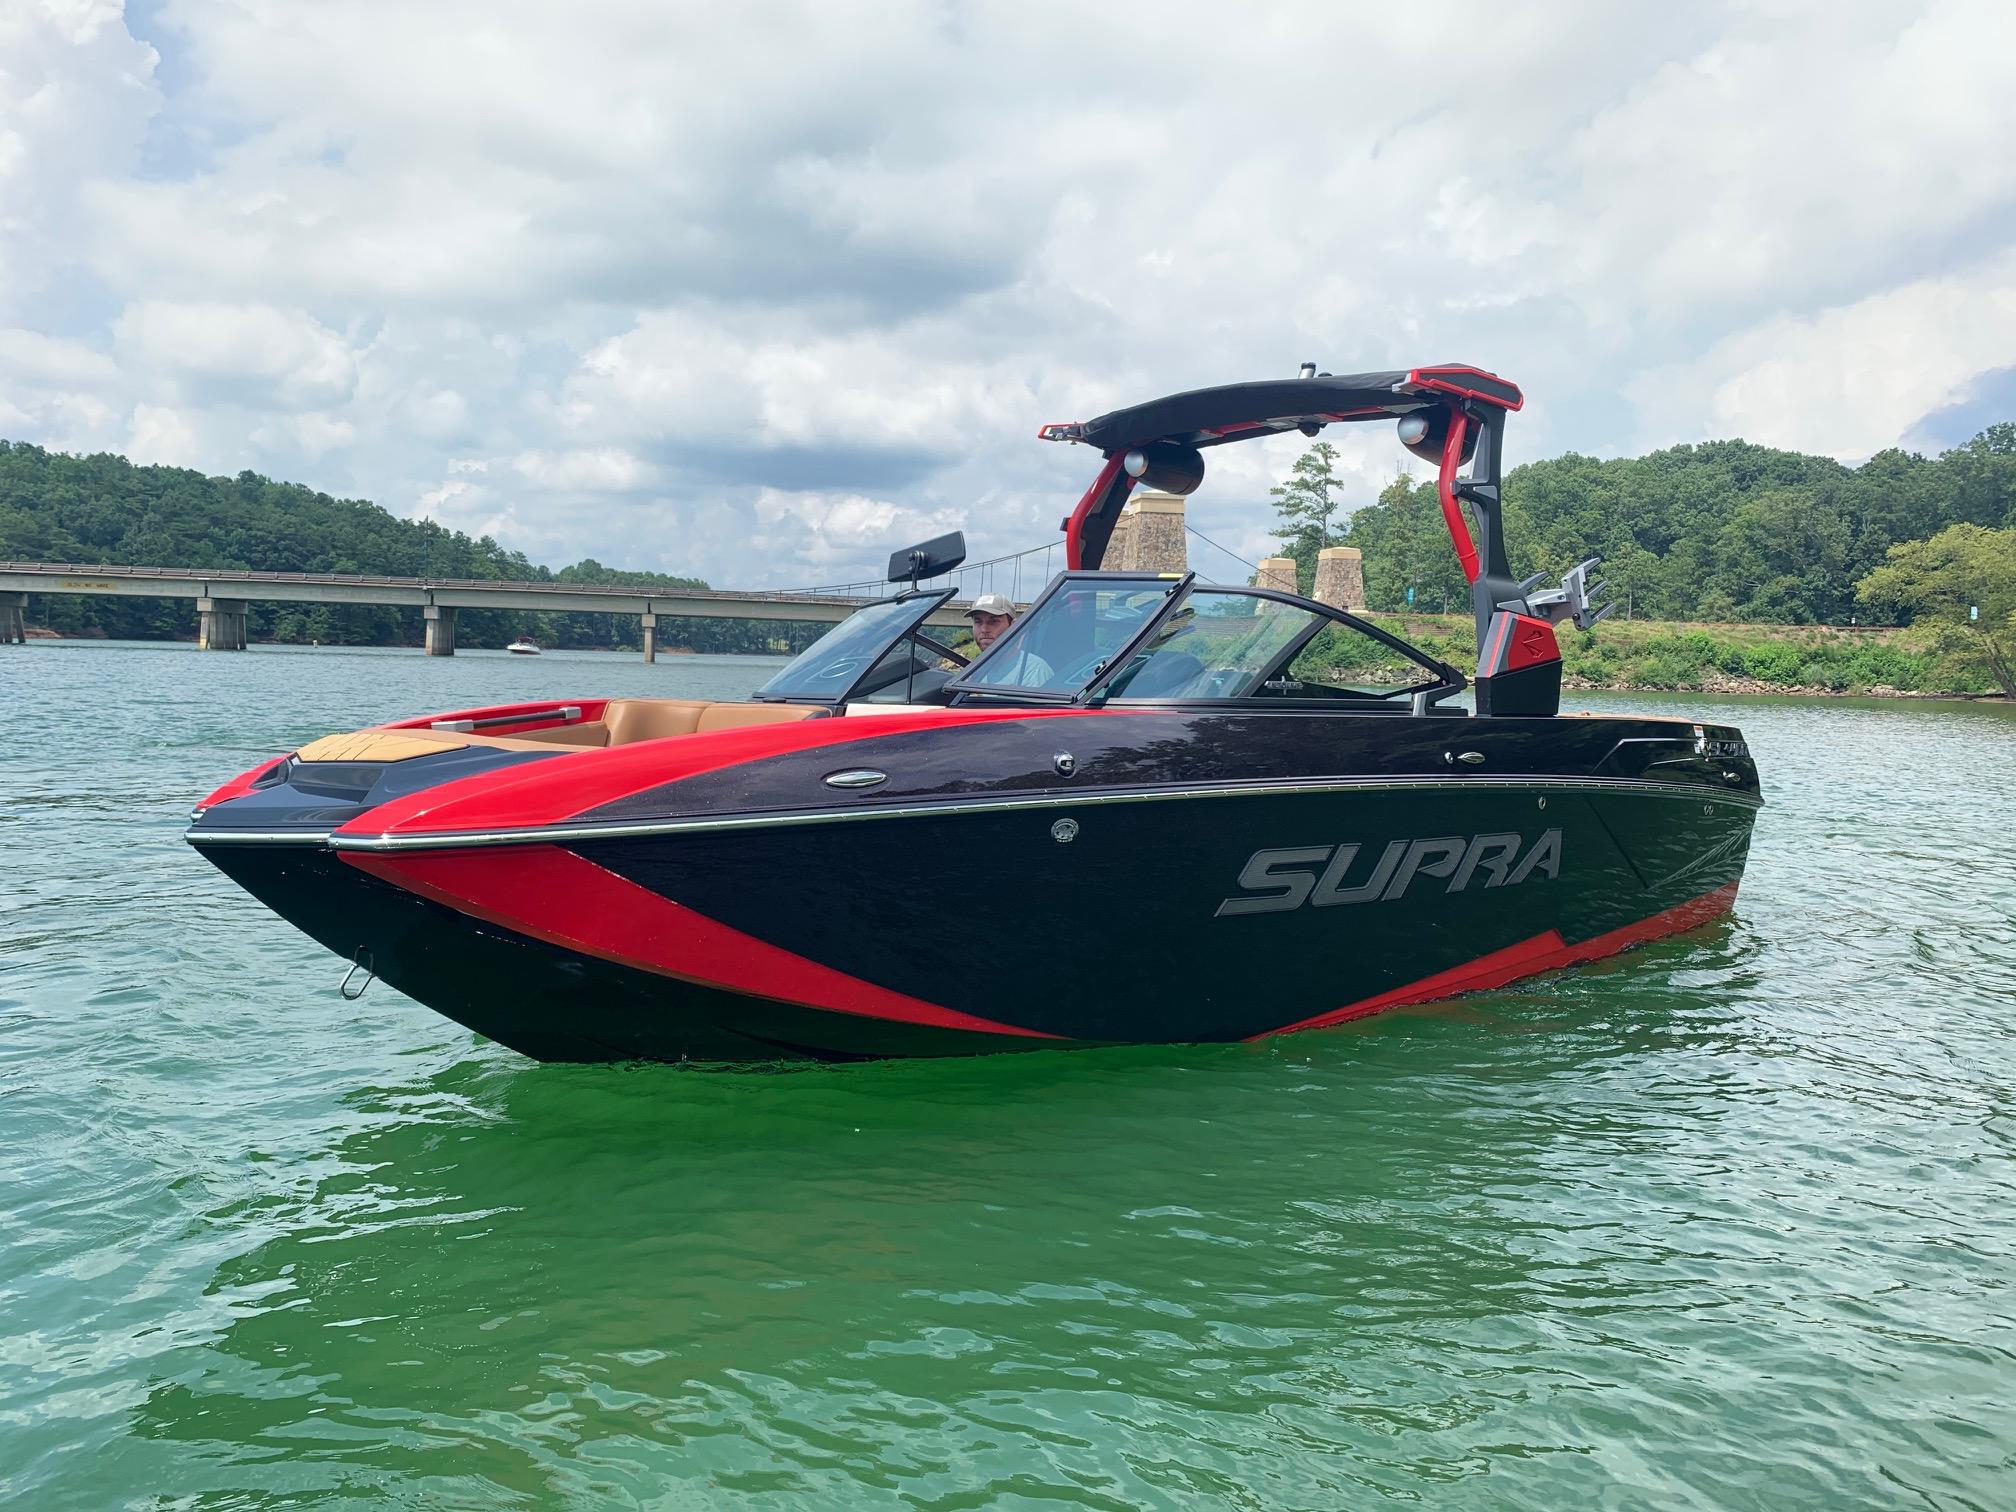 Supra SL 400